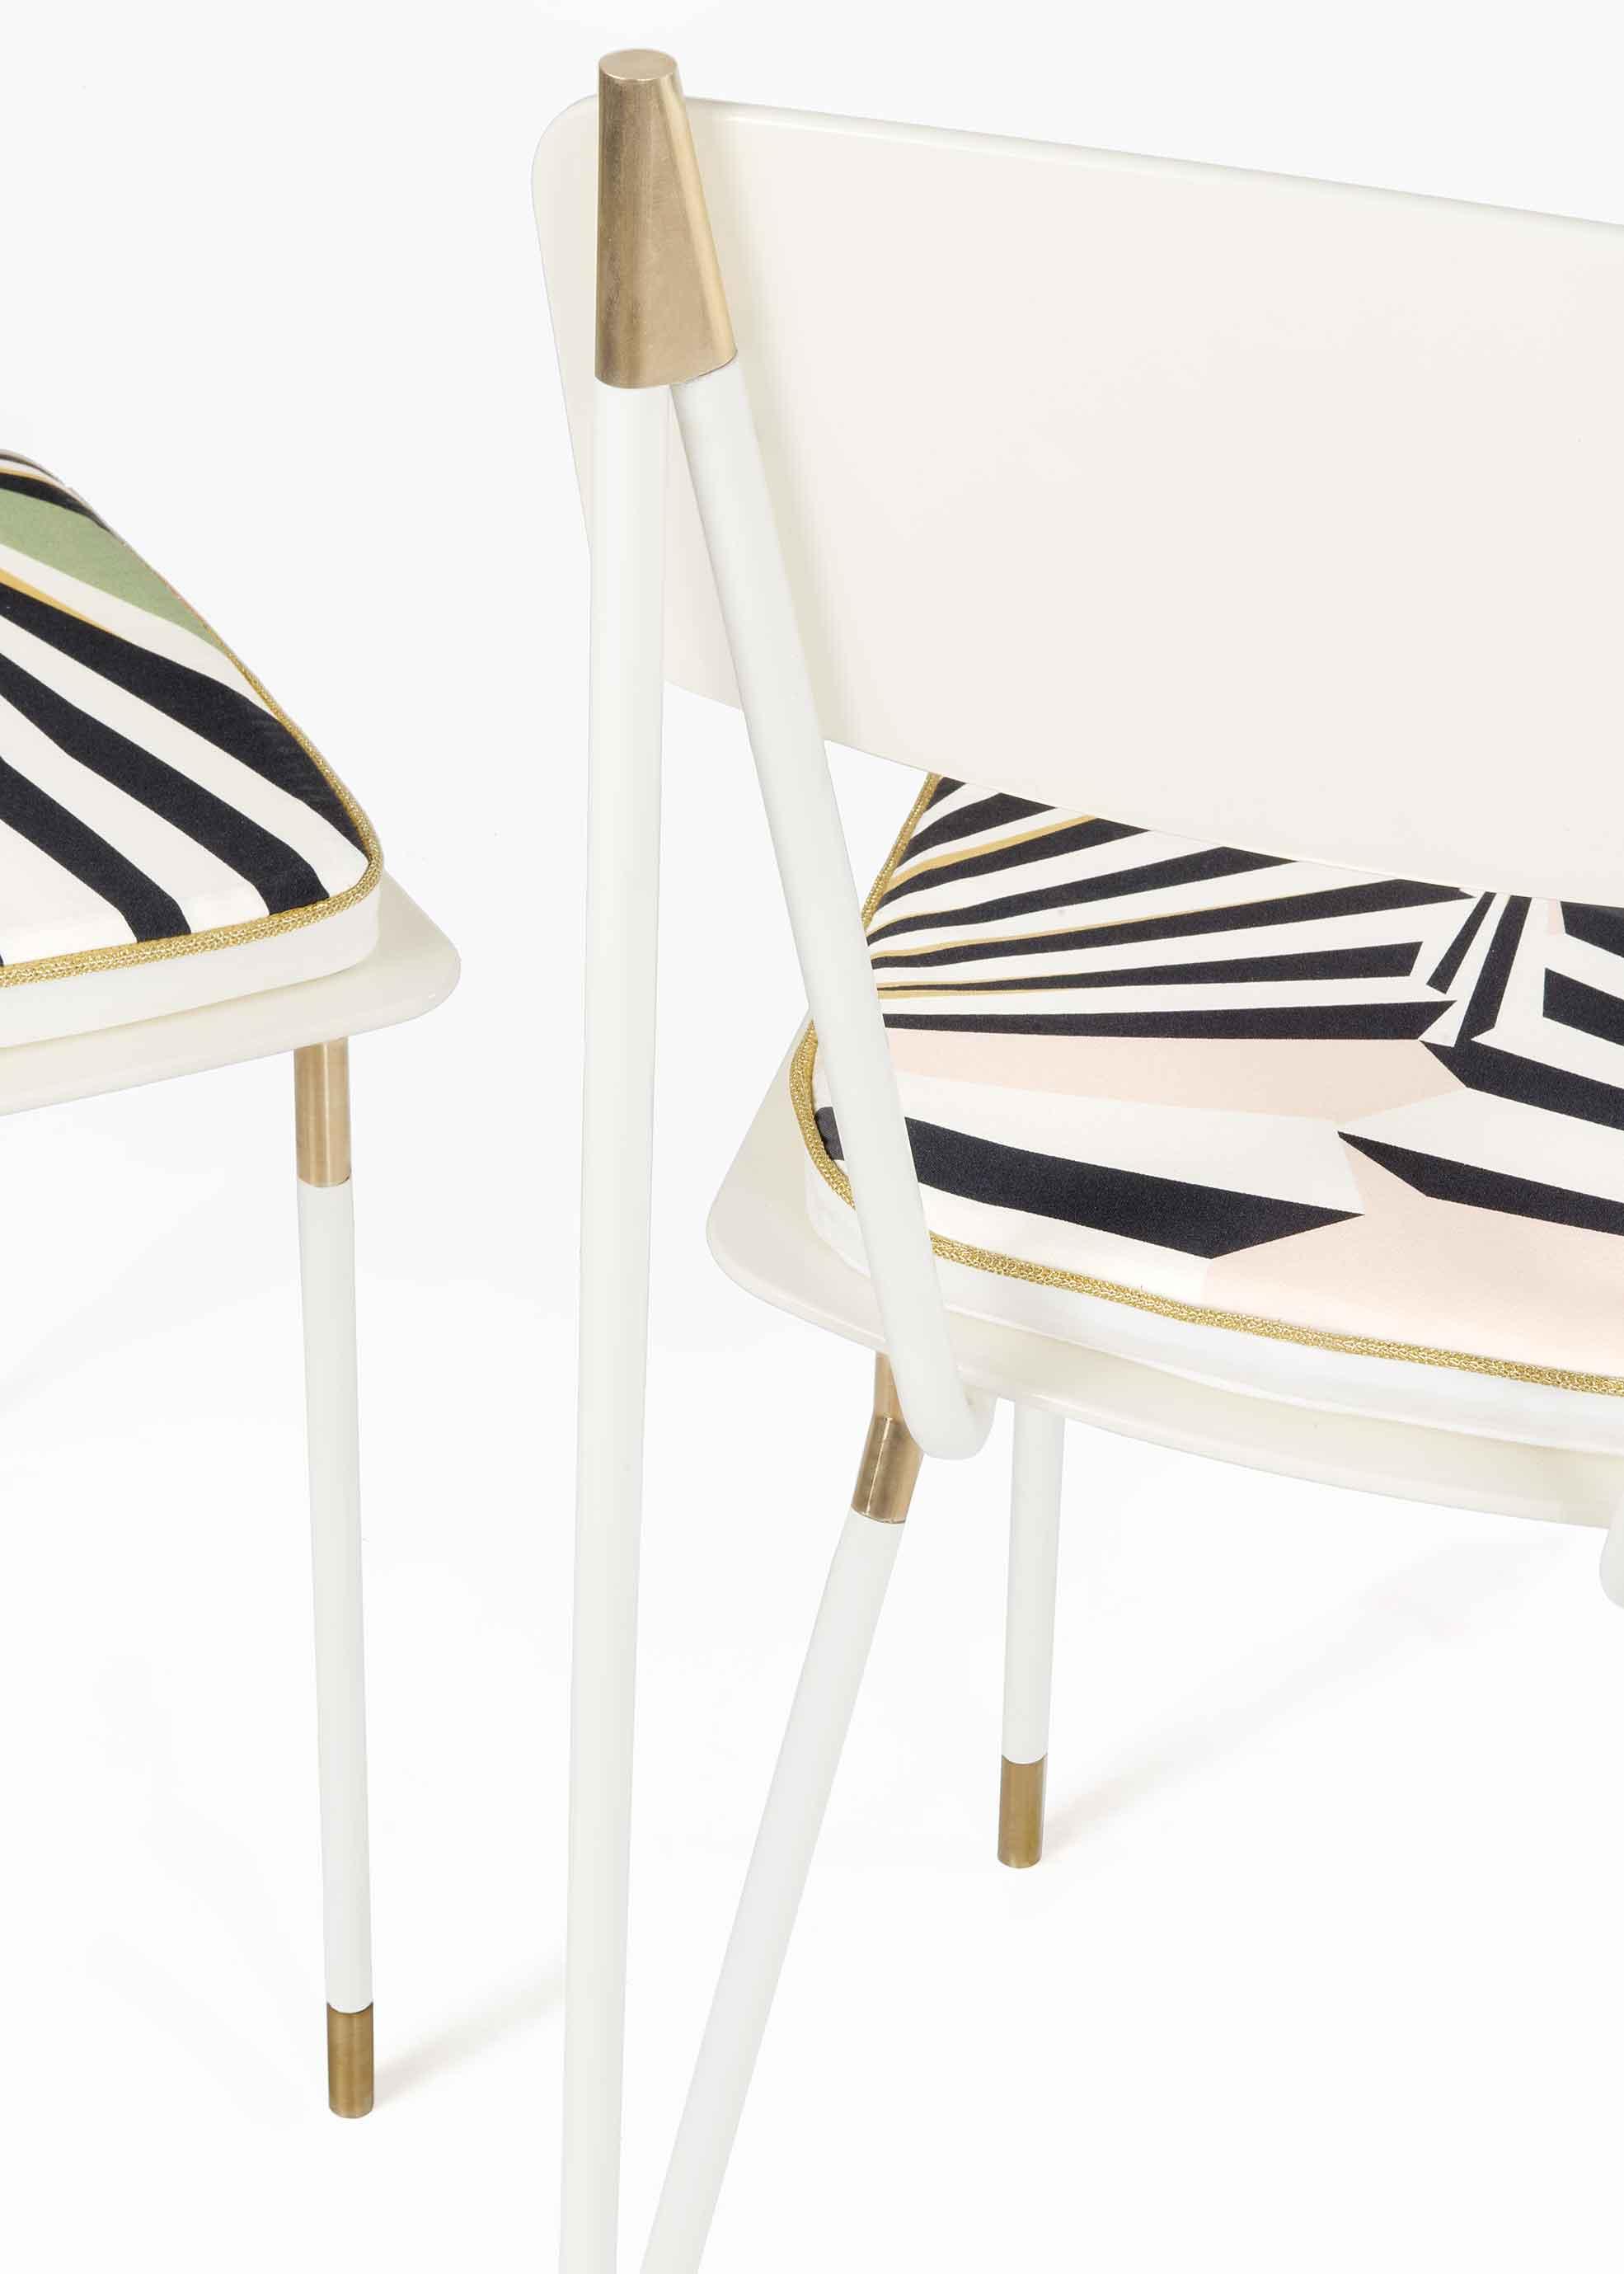 Still life of chairs of Aquiloni collection of the designer Derek Castiglioni Photographer Maria Teresa Furnari